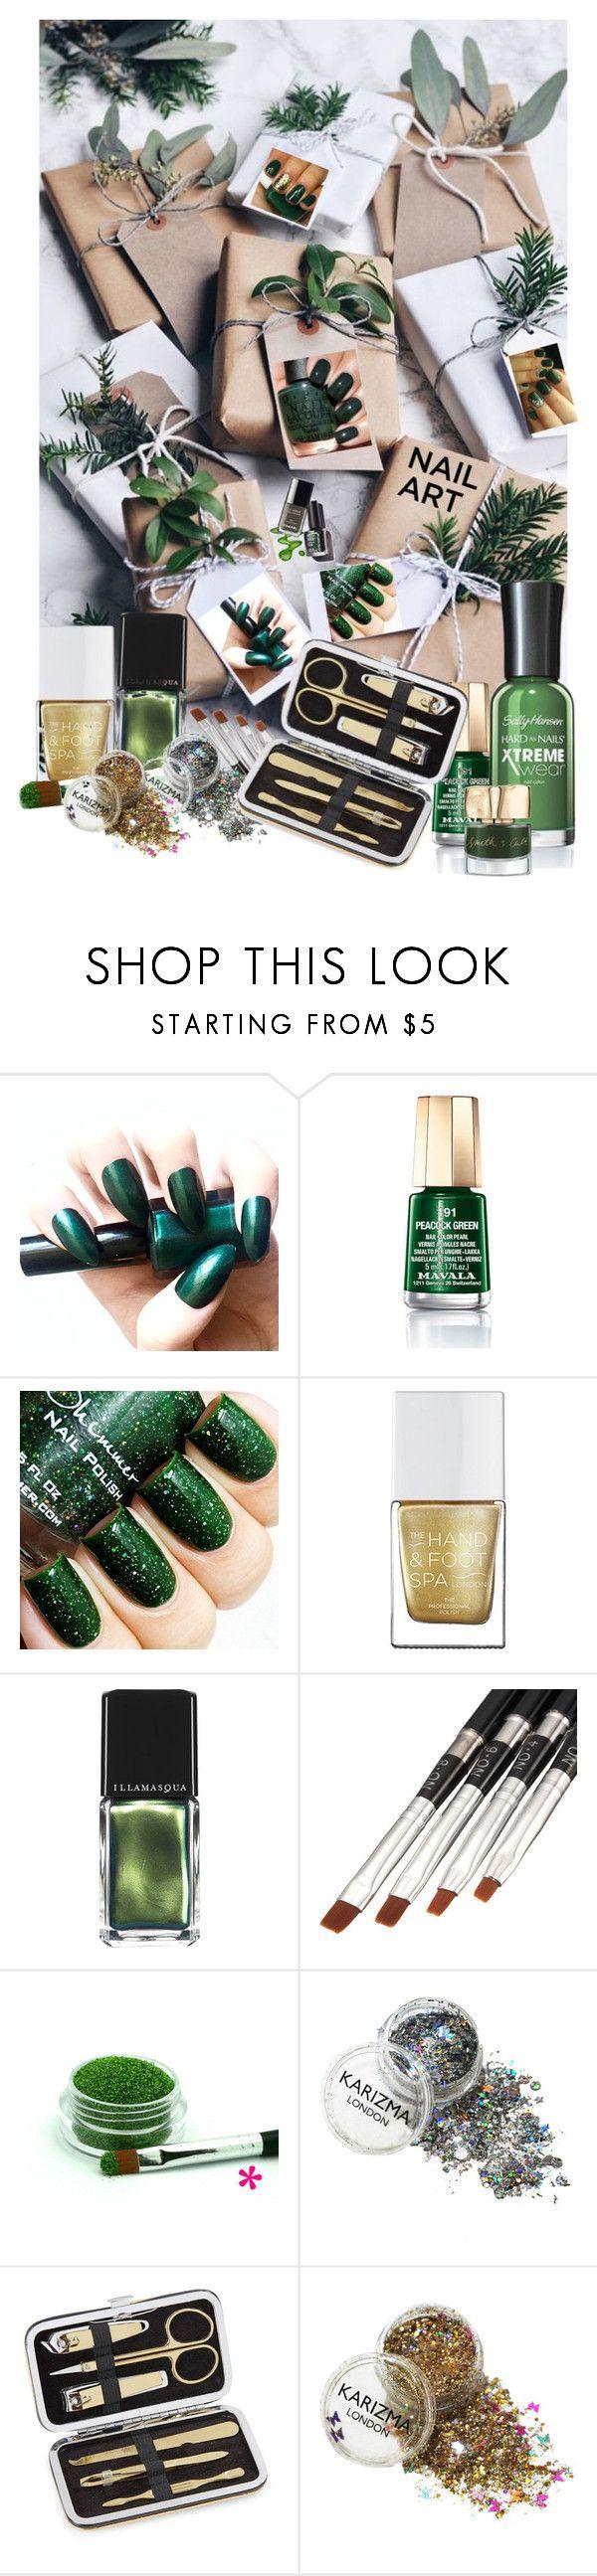 """Green Nail Art"" by summersunshinesk7 ❤ liked on Polyvore featuring beauty, Mavala, Illamasqua, Lord & Taylor, Smith & Cult, Winter, nailart, Beauty, GREEN and nailedit"